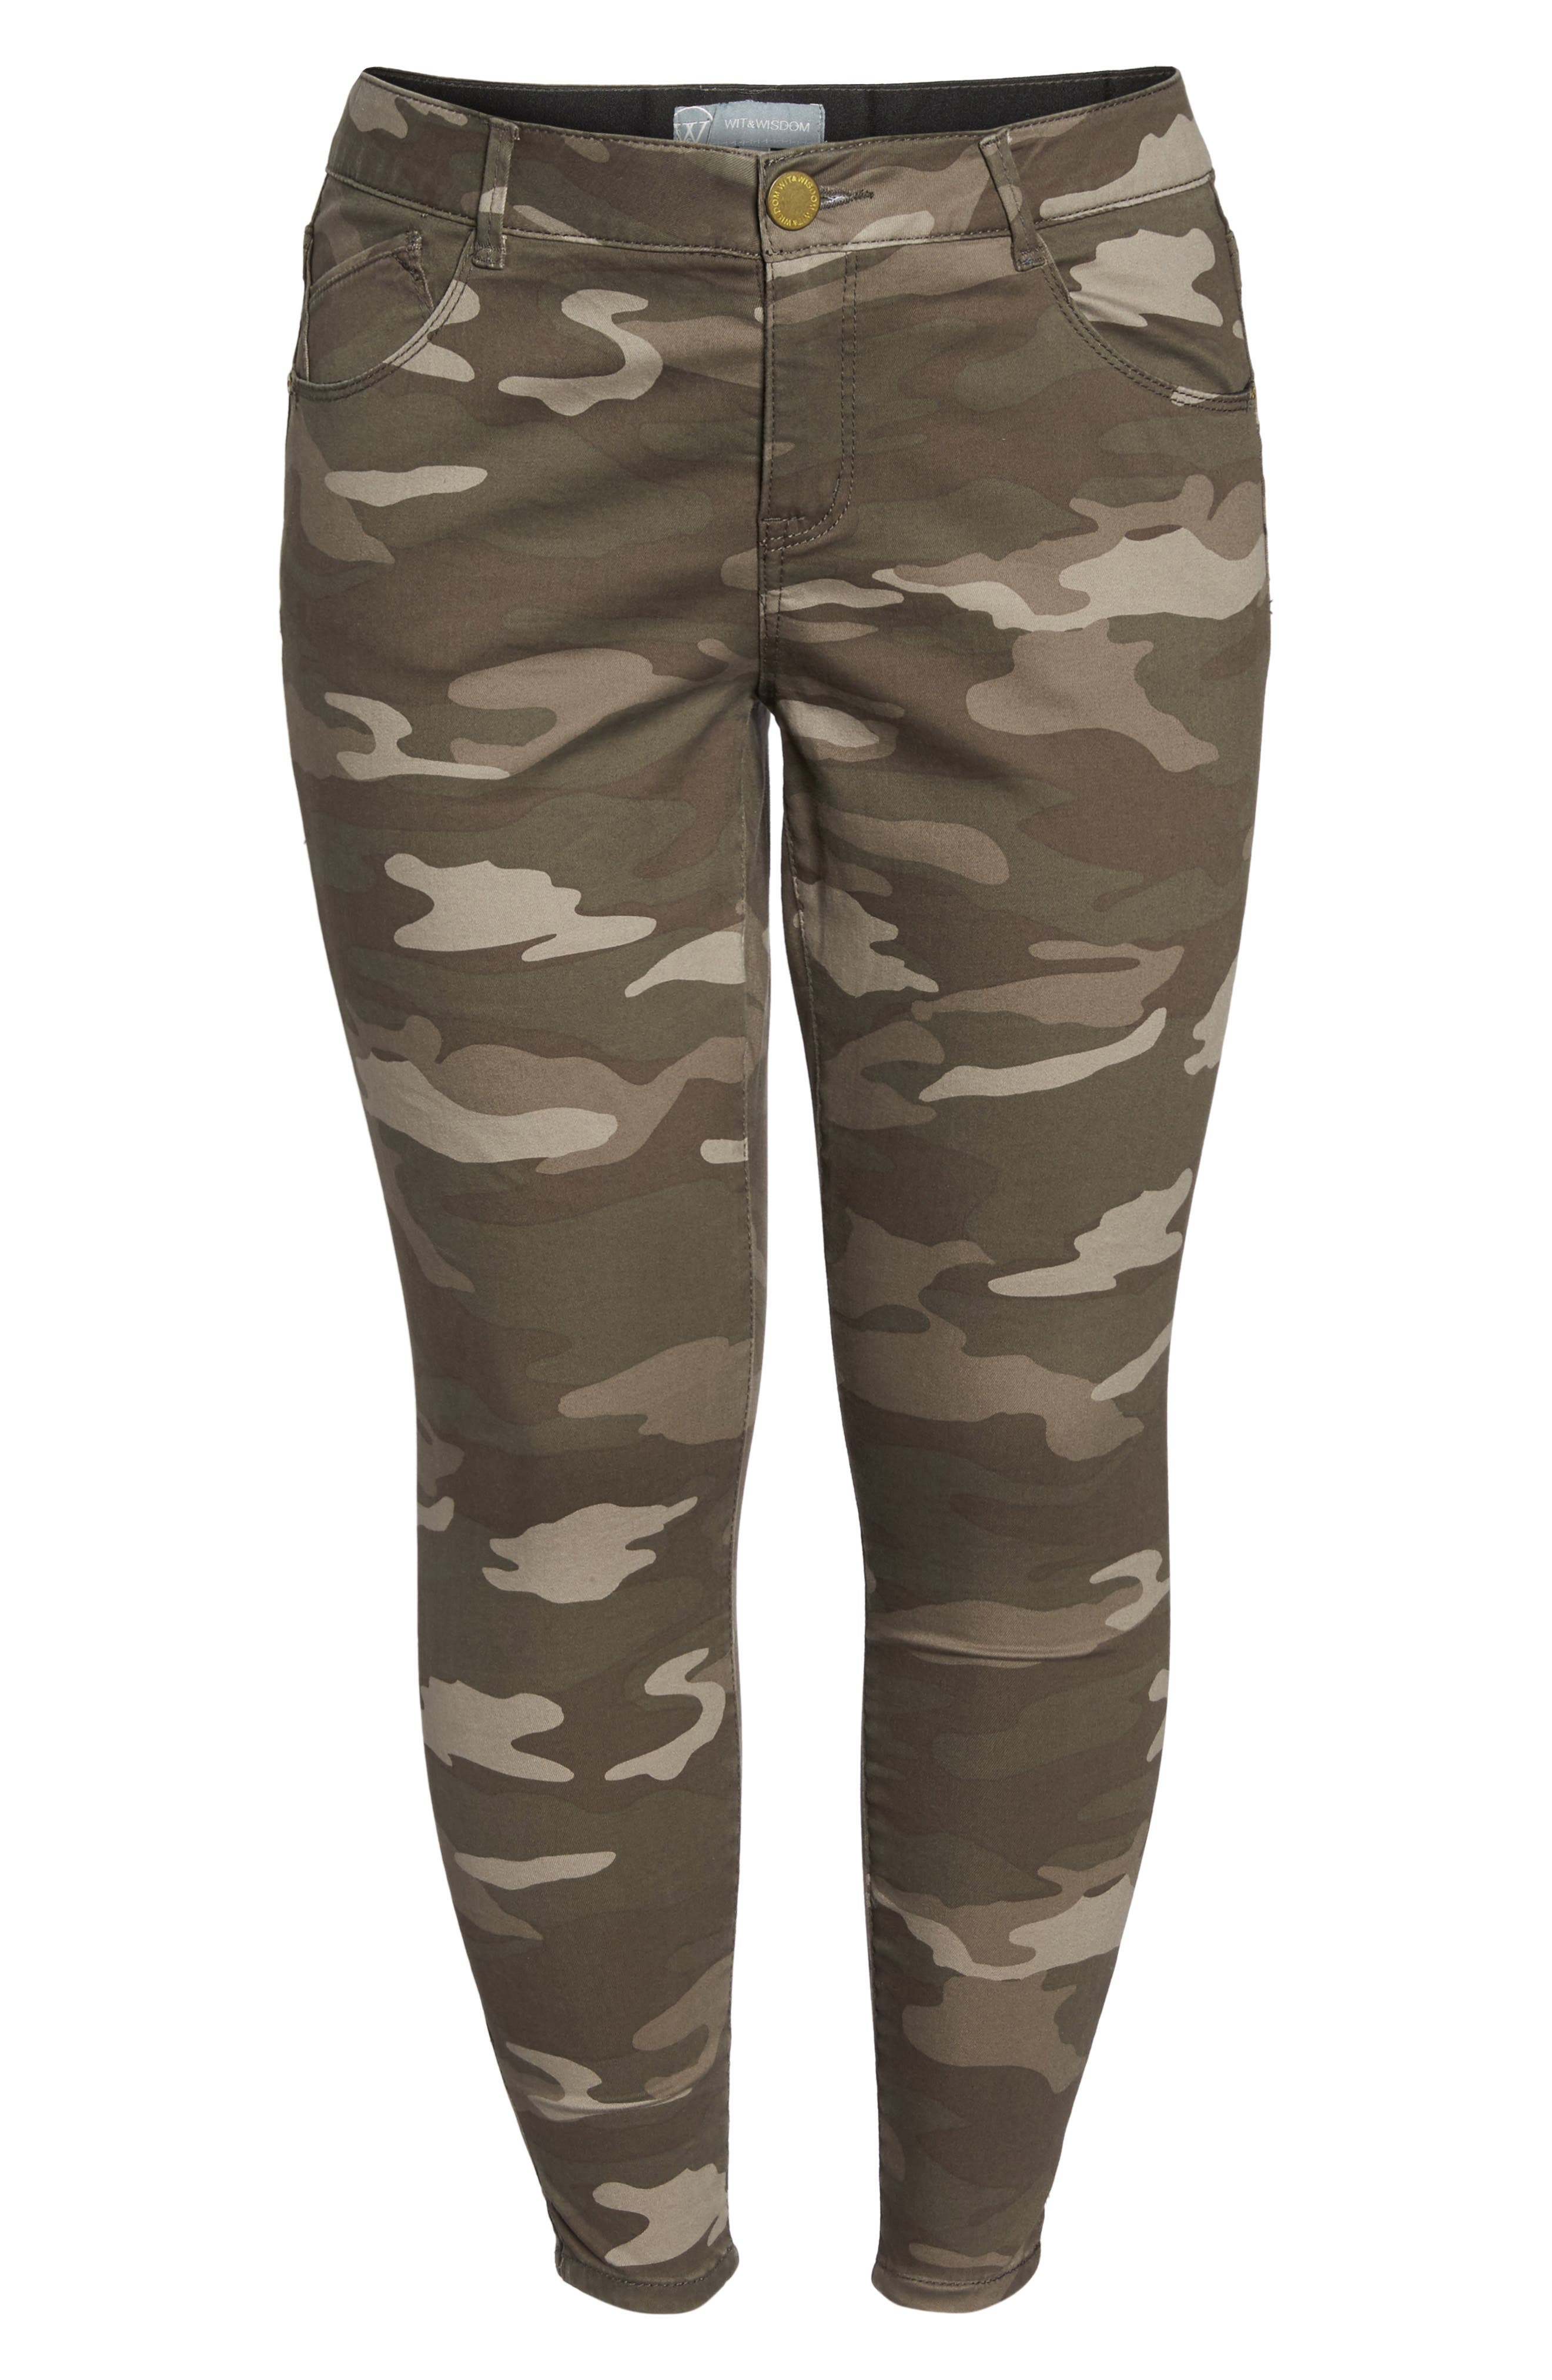 Ab-solution Camo Skinny Pants,                             Alternate thumbnail 6, color,                             250